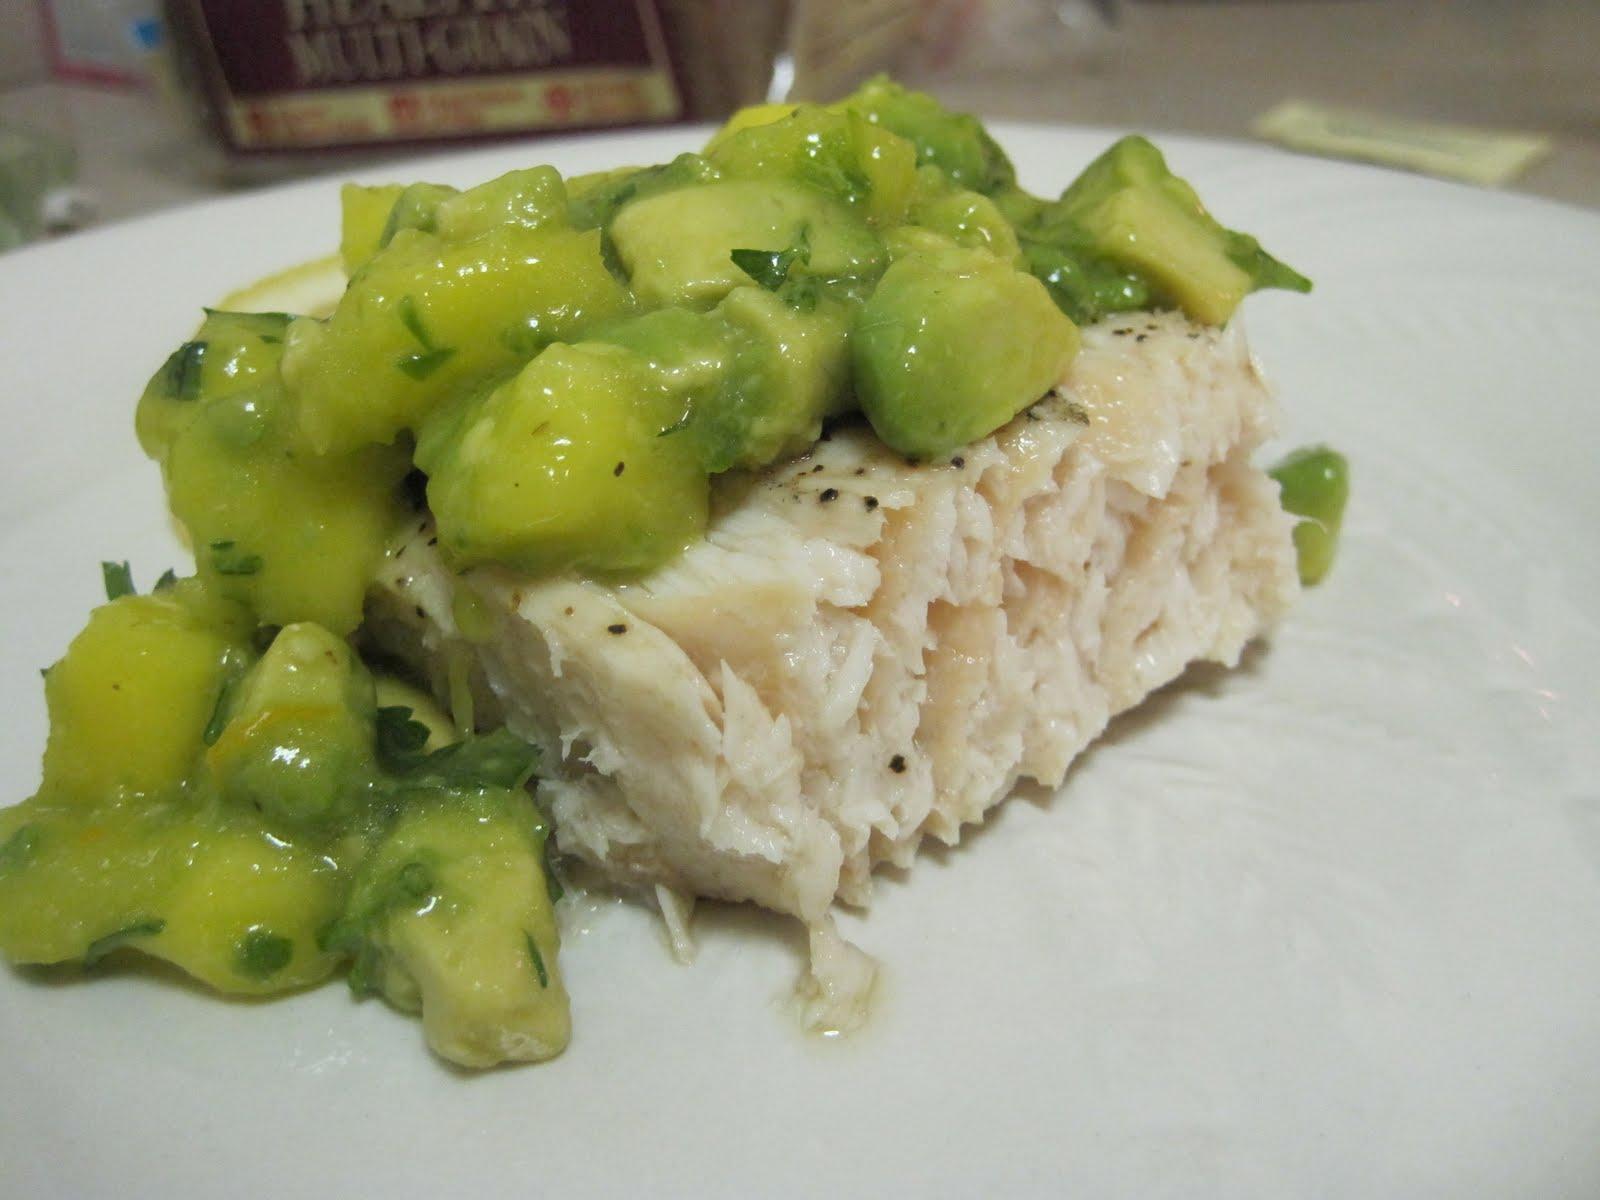 Bicoastal chefs grilled opah with mango avocado salsa for Opah fish recipes